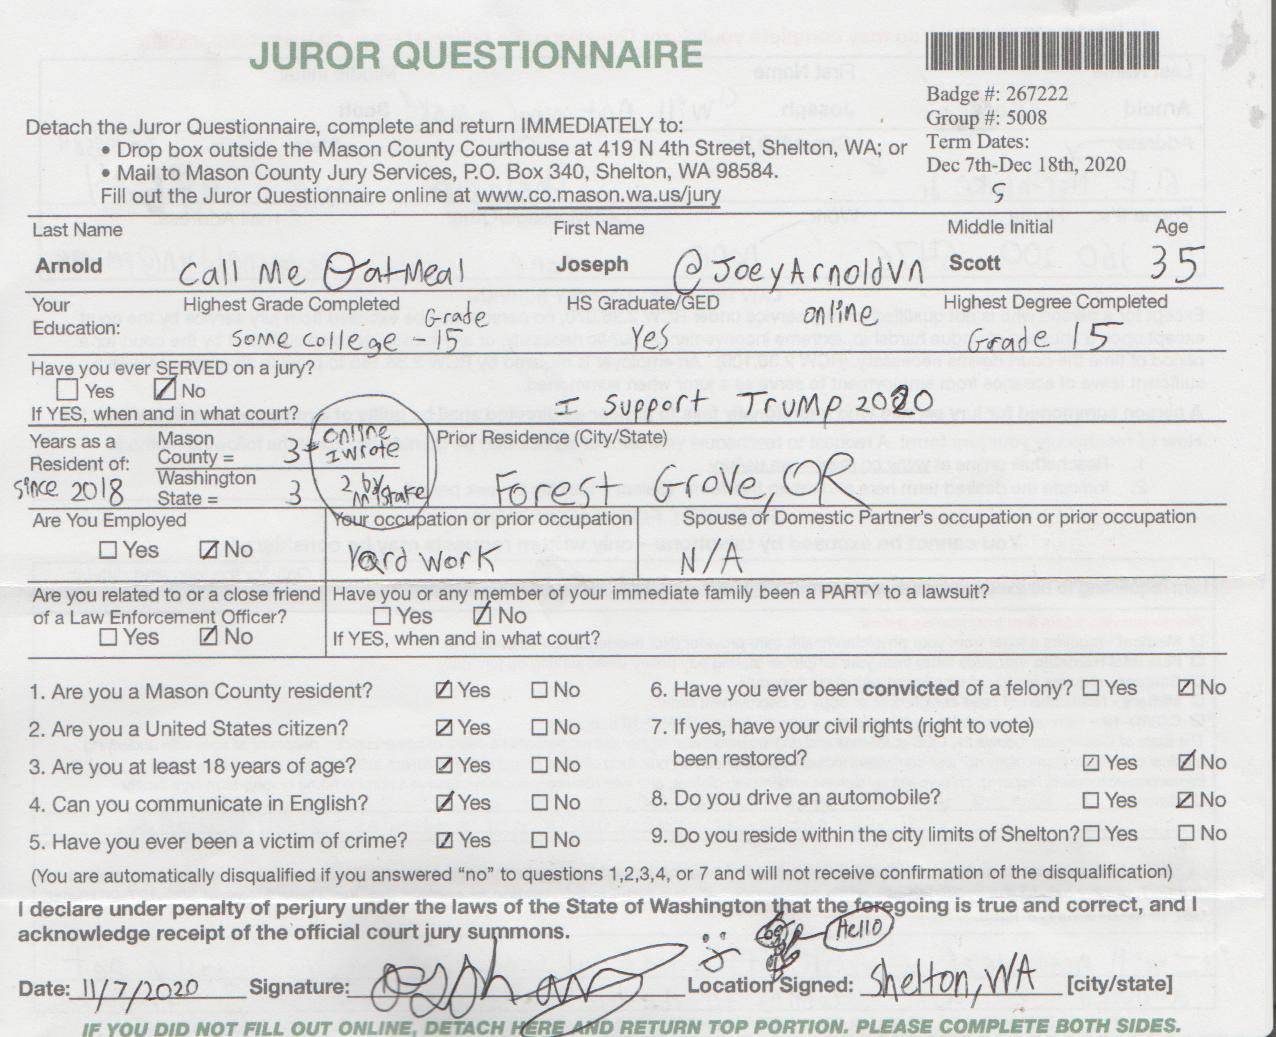 2020-11-07 - Saturday - 03:00 PM LMS JA - Jury Duty Request - Shelton WA - Form & Survey Pages Update Again-1.png